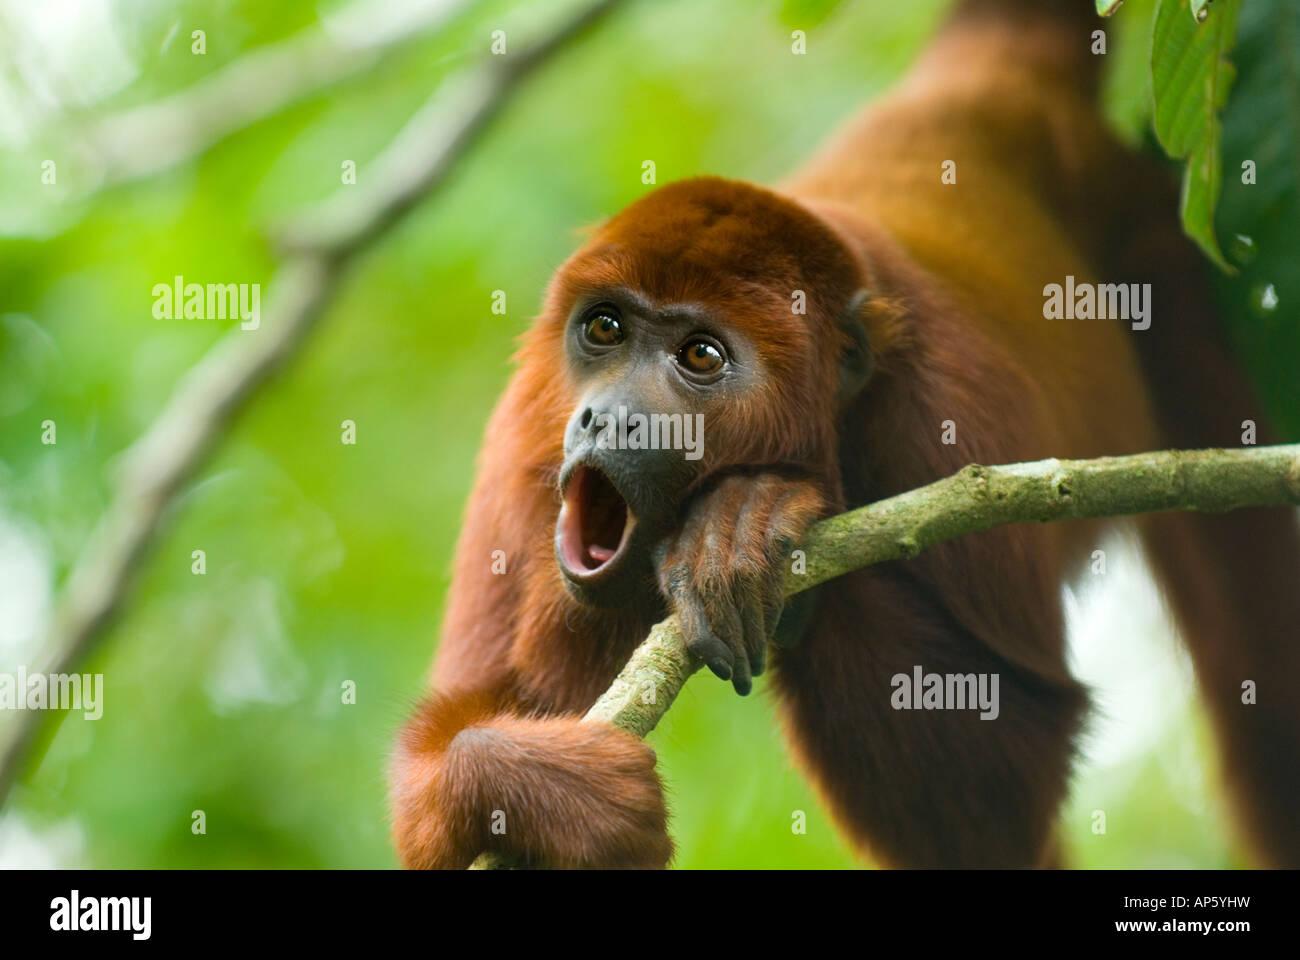 RED HOWLER MONKEY Alouatta seniculus howling Amazon Rainforest - Stock Image